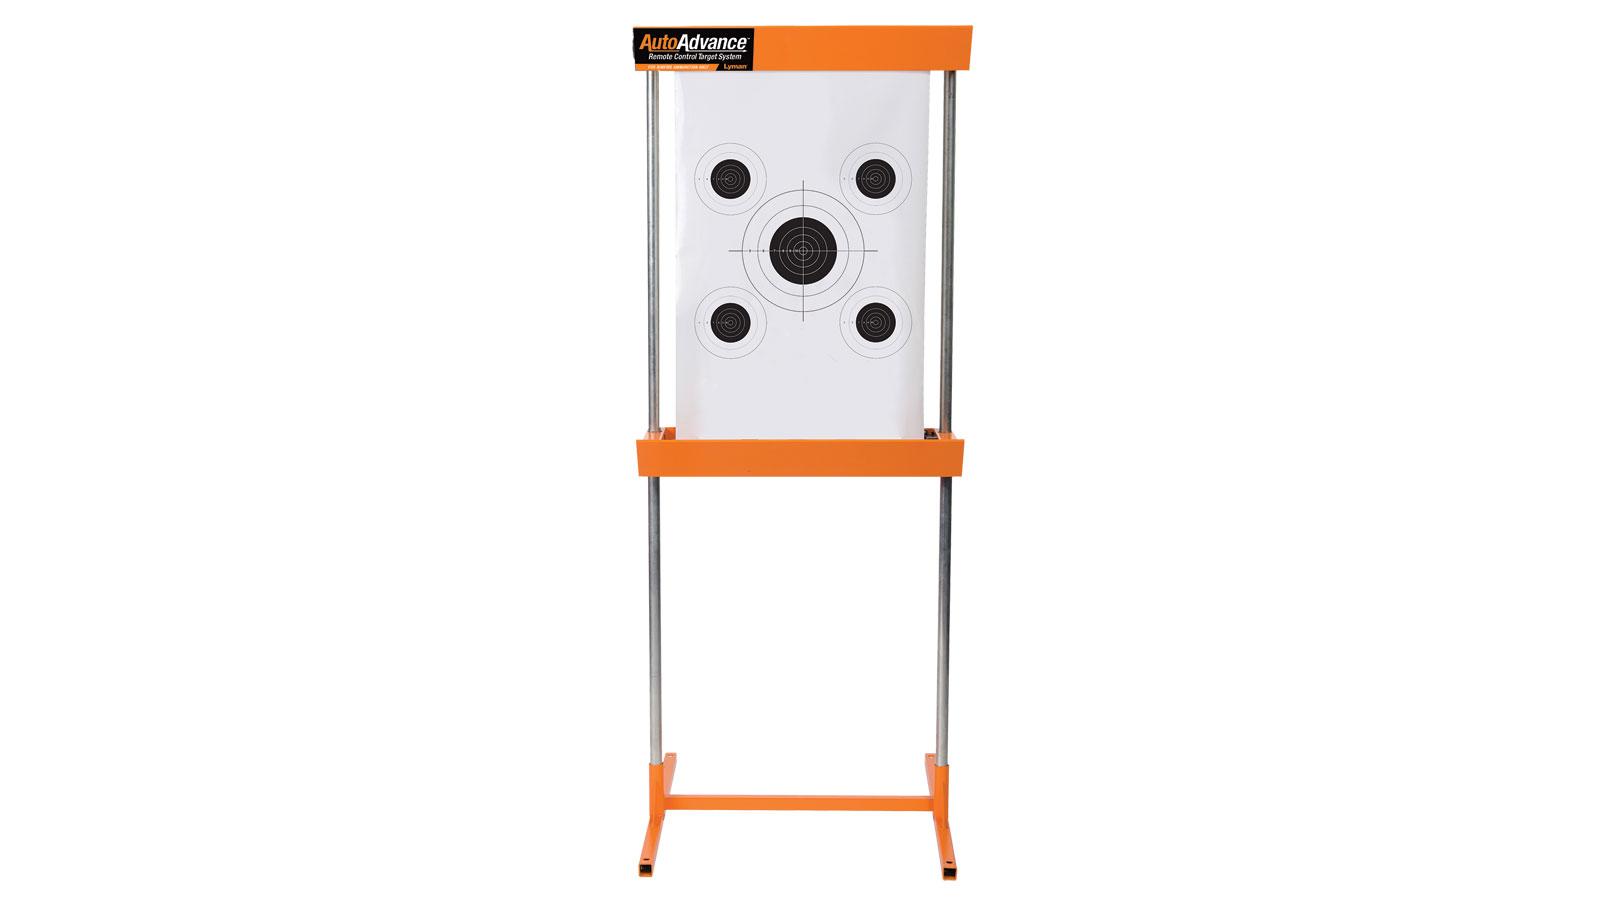 Lyman 4320051 Auto-Advance Target System 1 Metal Frame|5 Targets|1 Corrugated Plastic Board